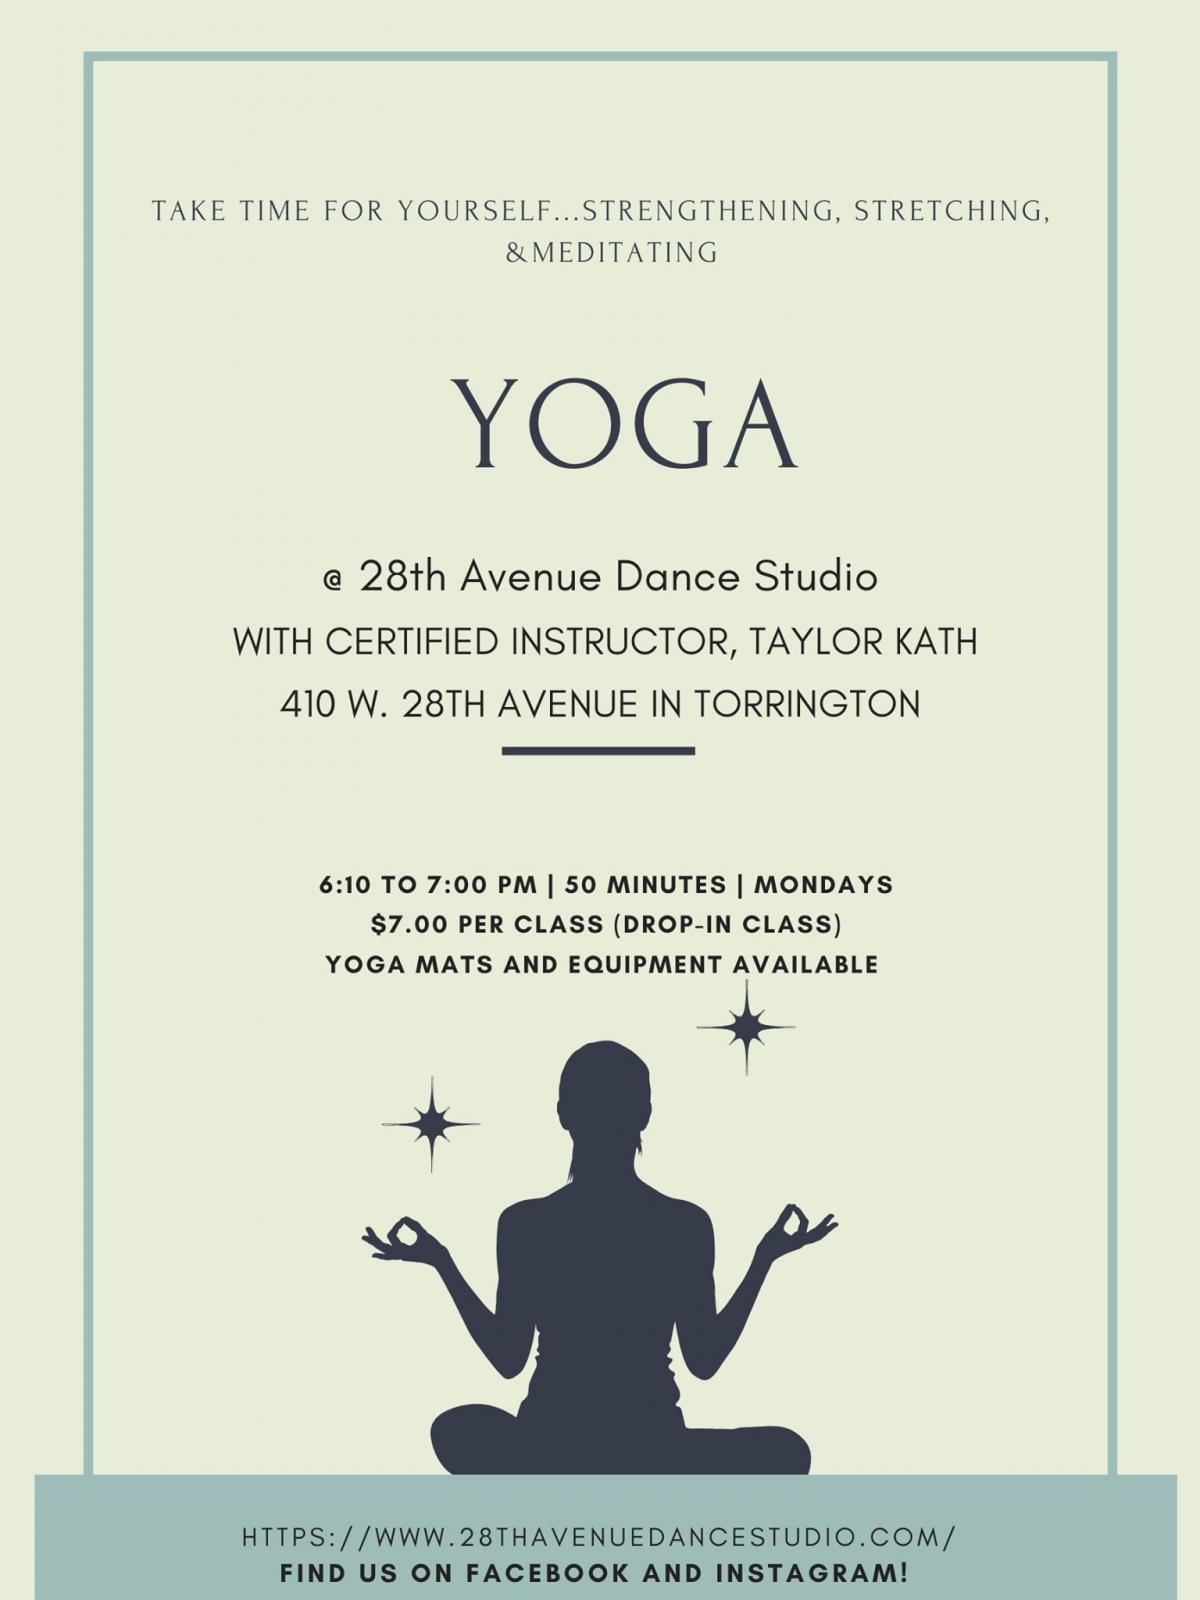 Yoga @ 28th Avenue Dance Studio Photo